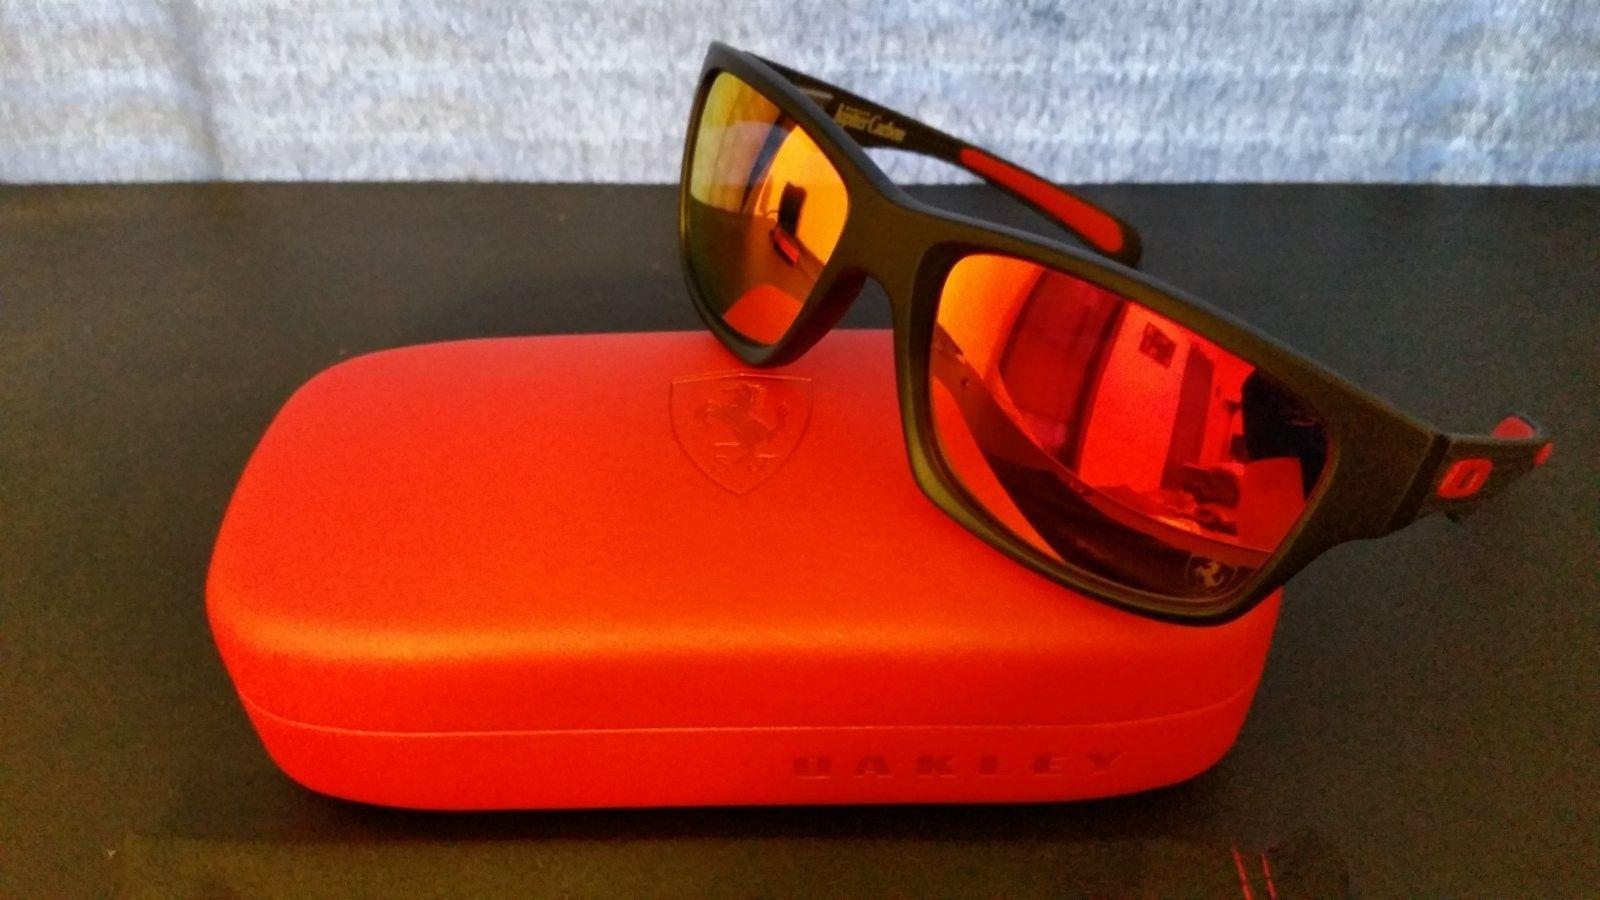 Ferrari Fuel Cell, Ferrari Style Switch, & Ferrari Jupiter Carbon - 20141029_175625.jpg